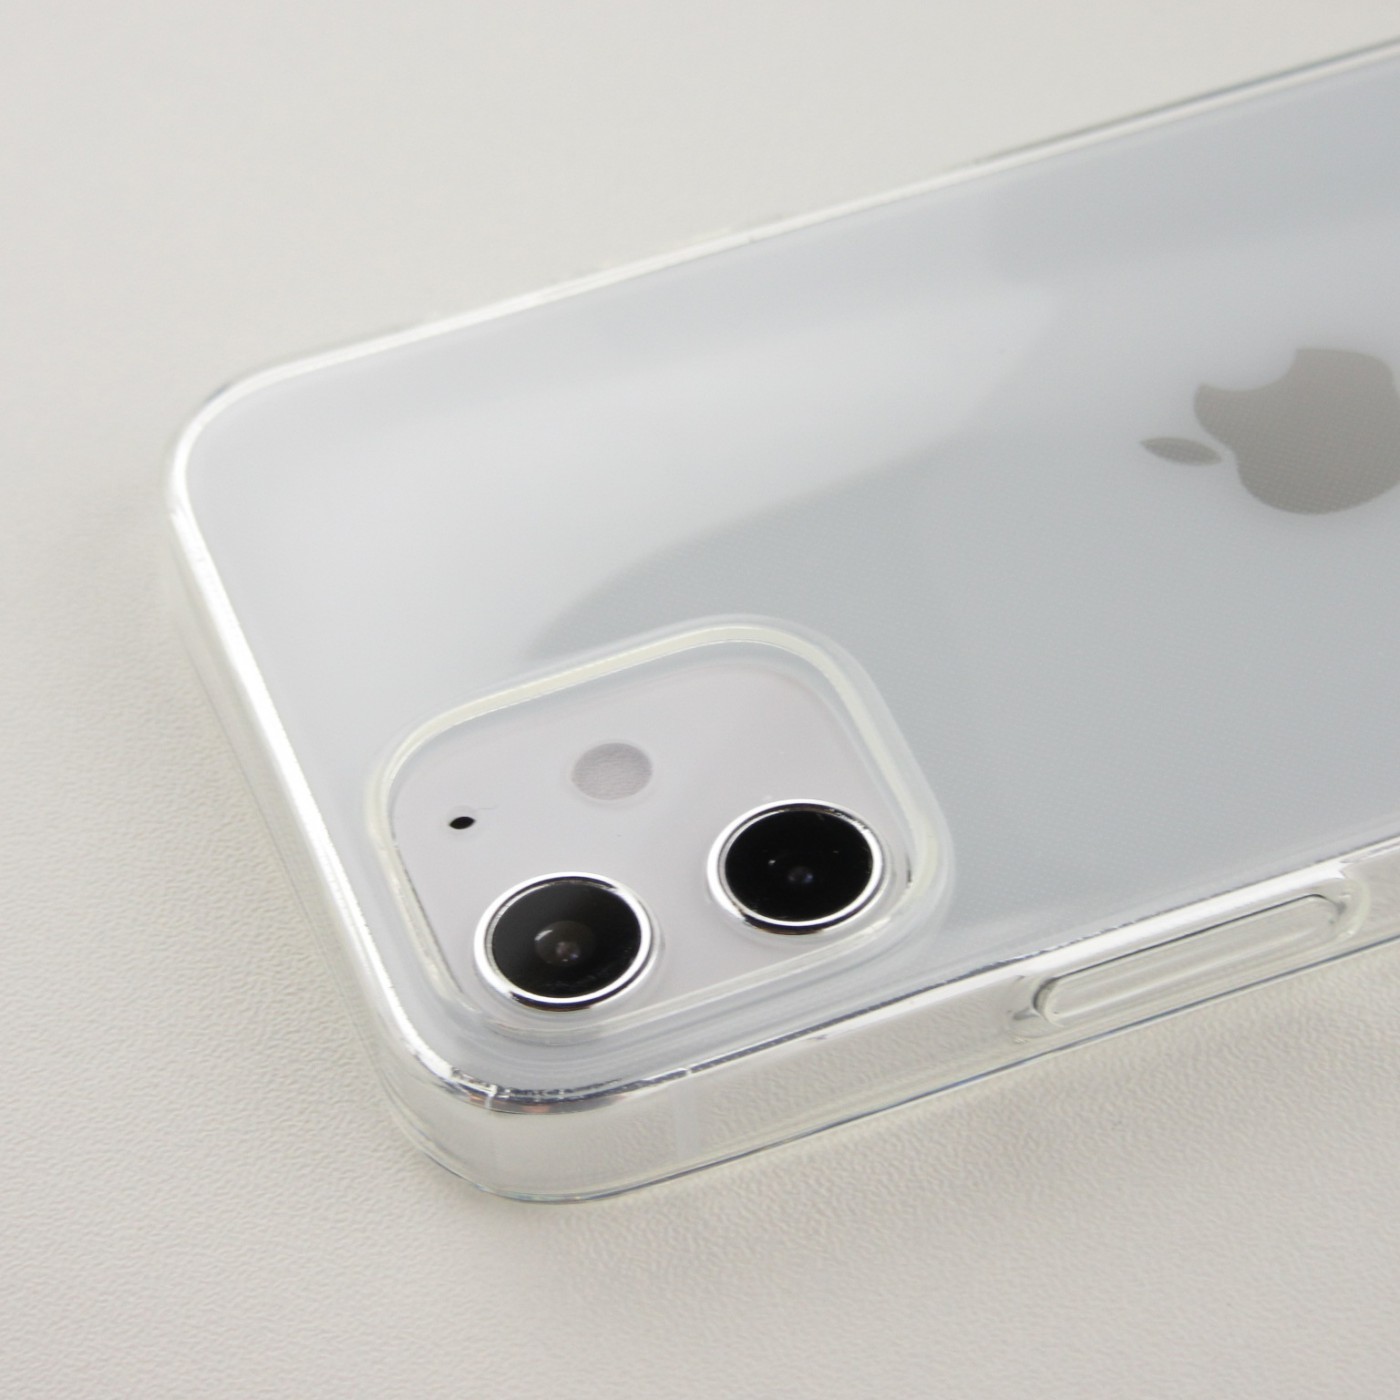 Coque iPhone 12 / 12 Pro - Ultra-thin gel transparent